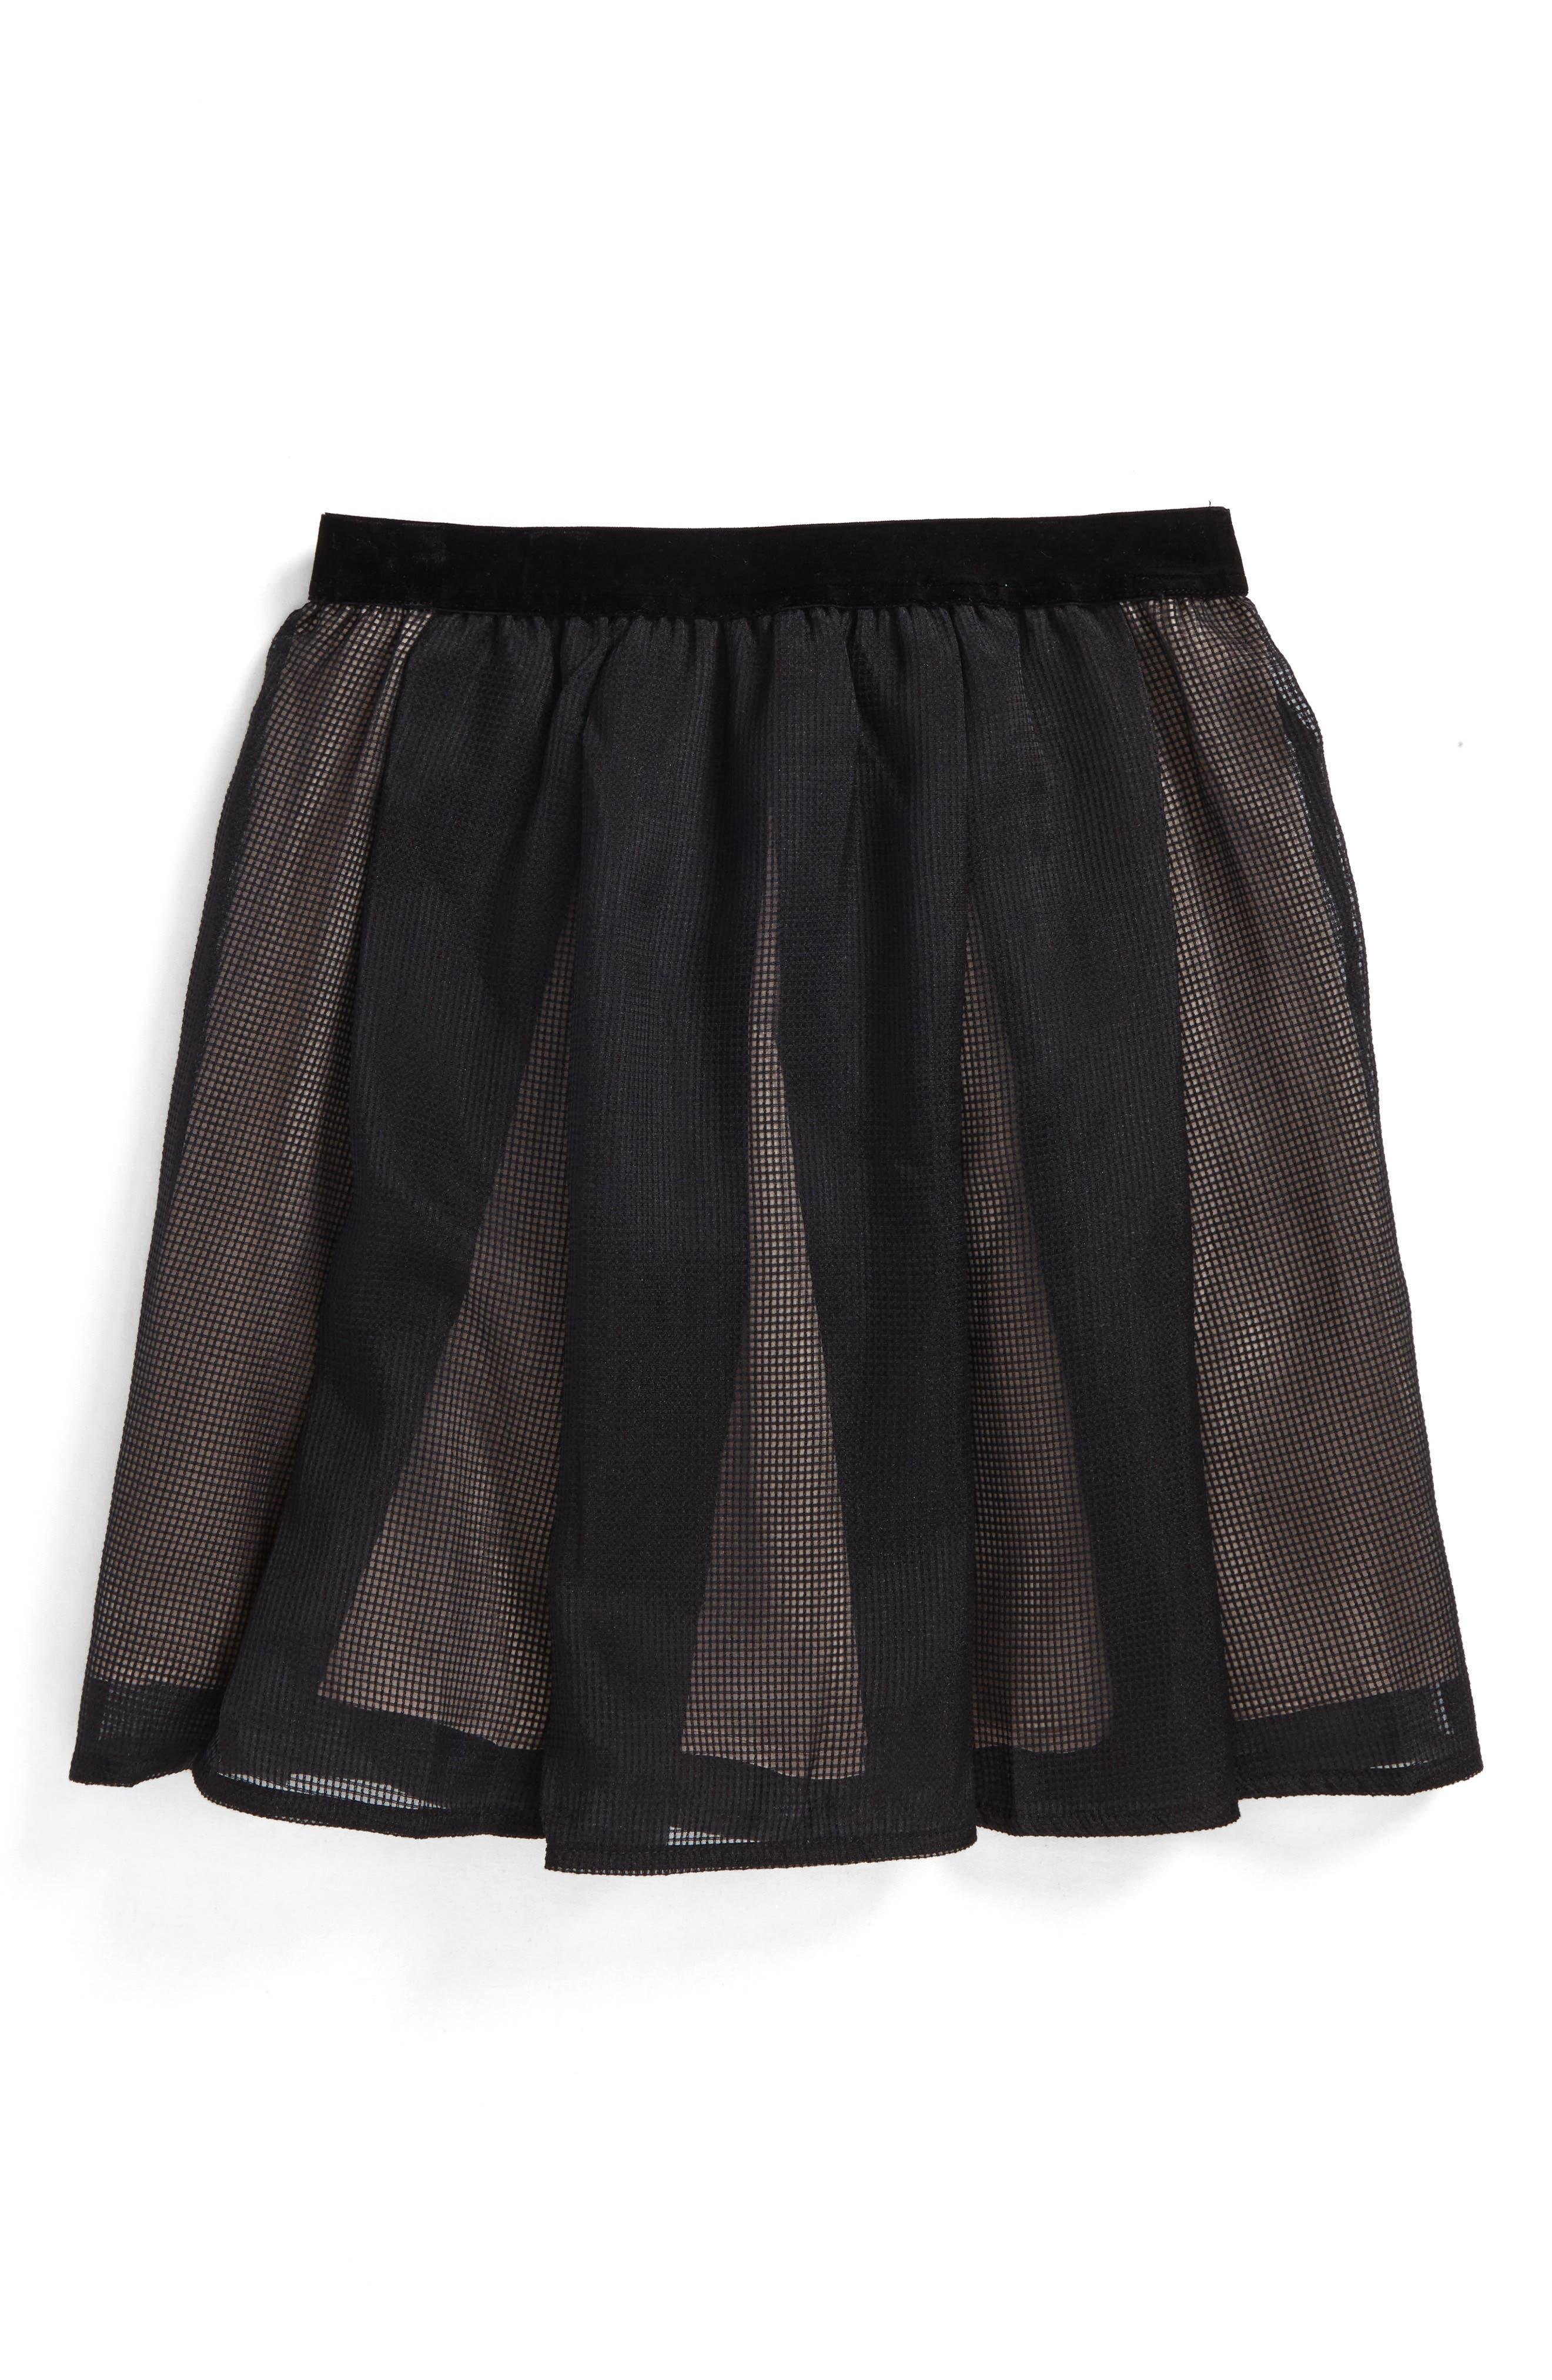 Blaire Mesh Skirt,                         Main,                         color, 001